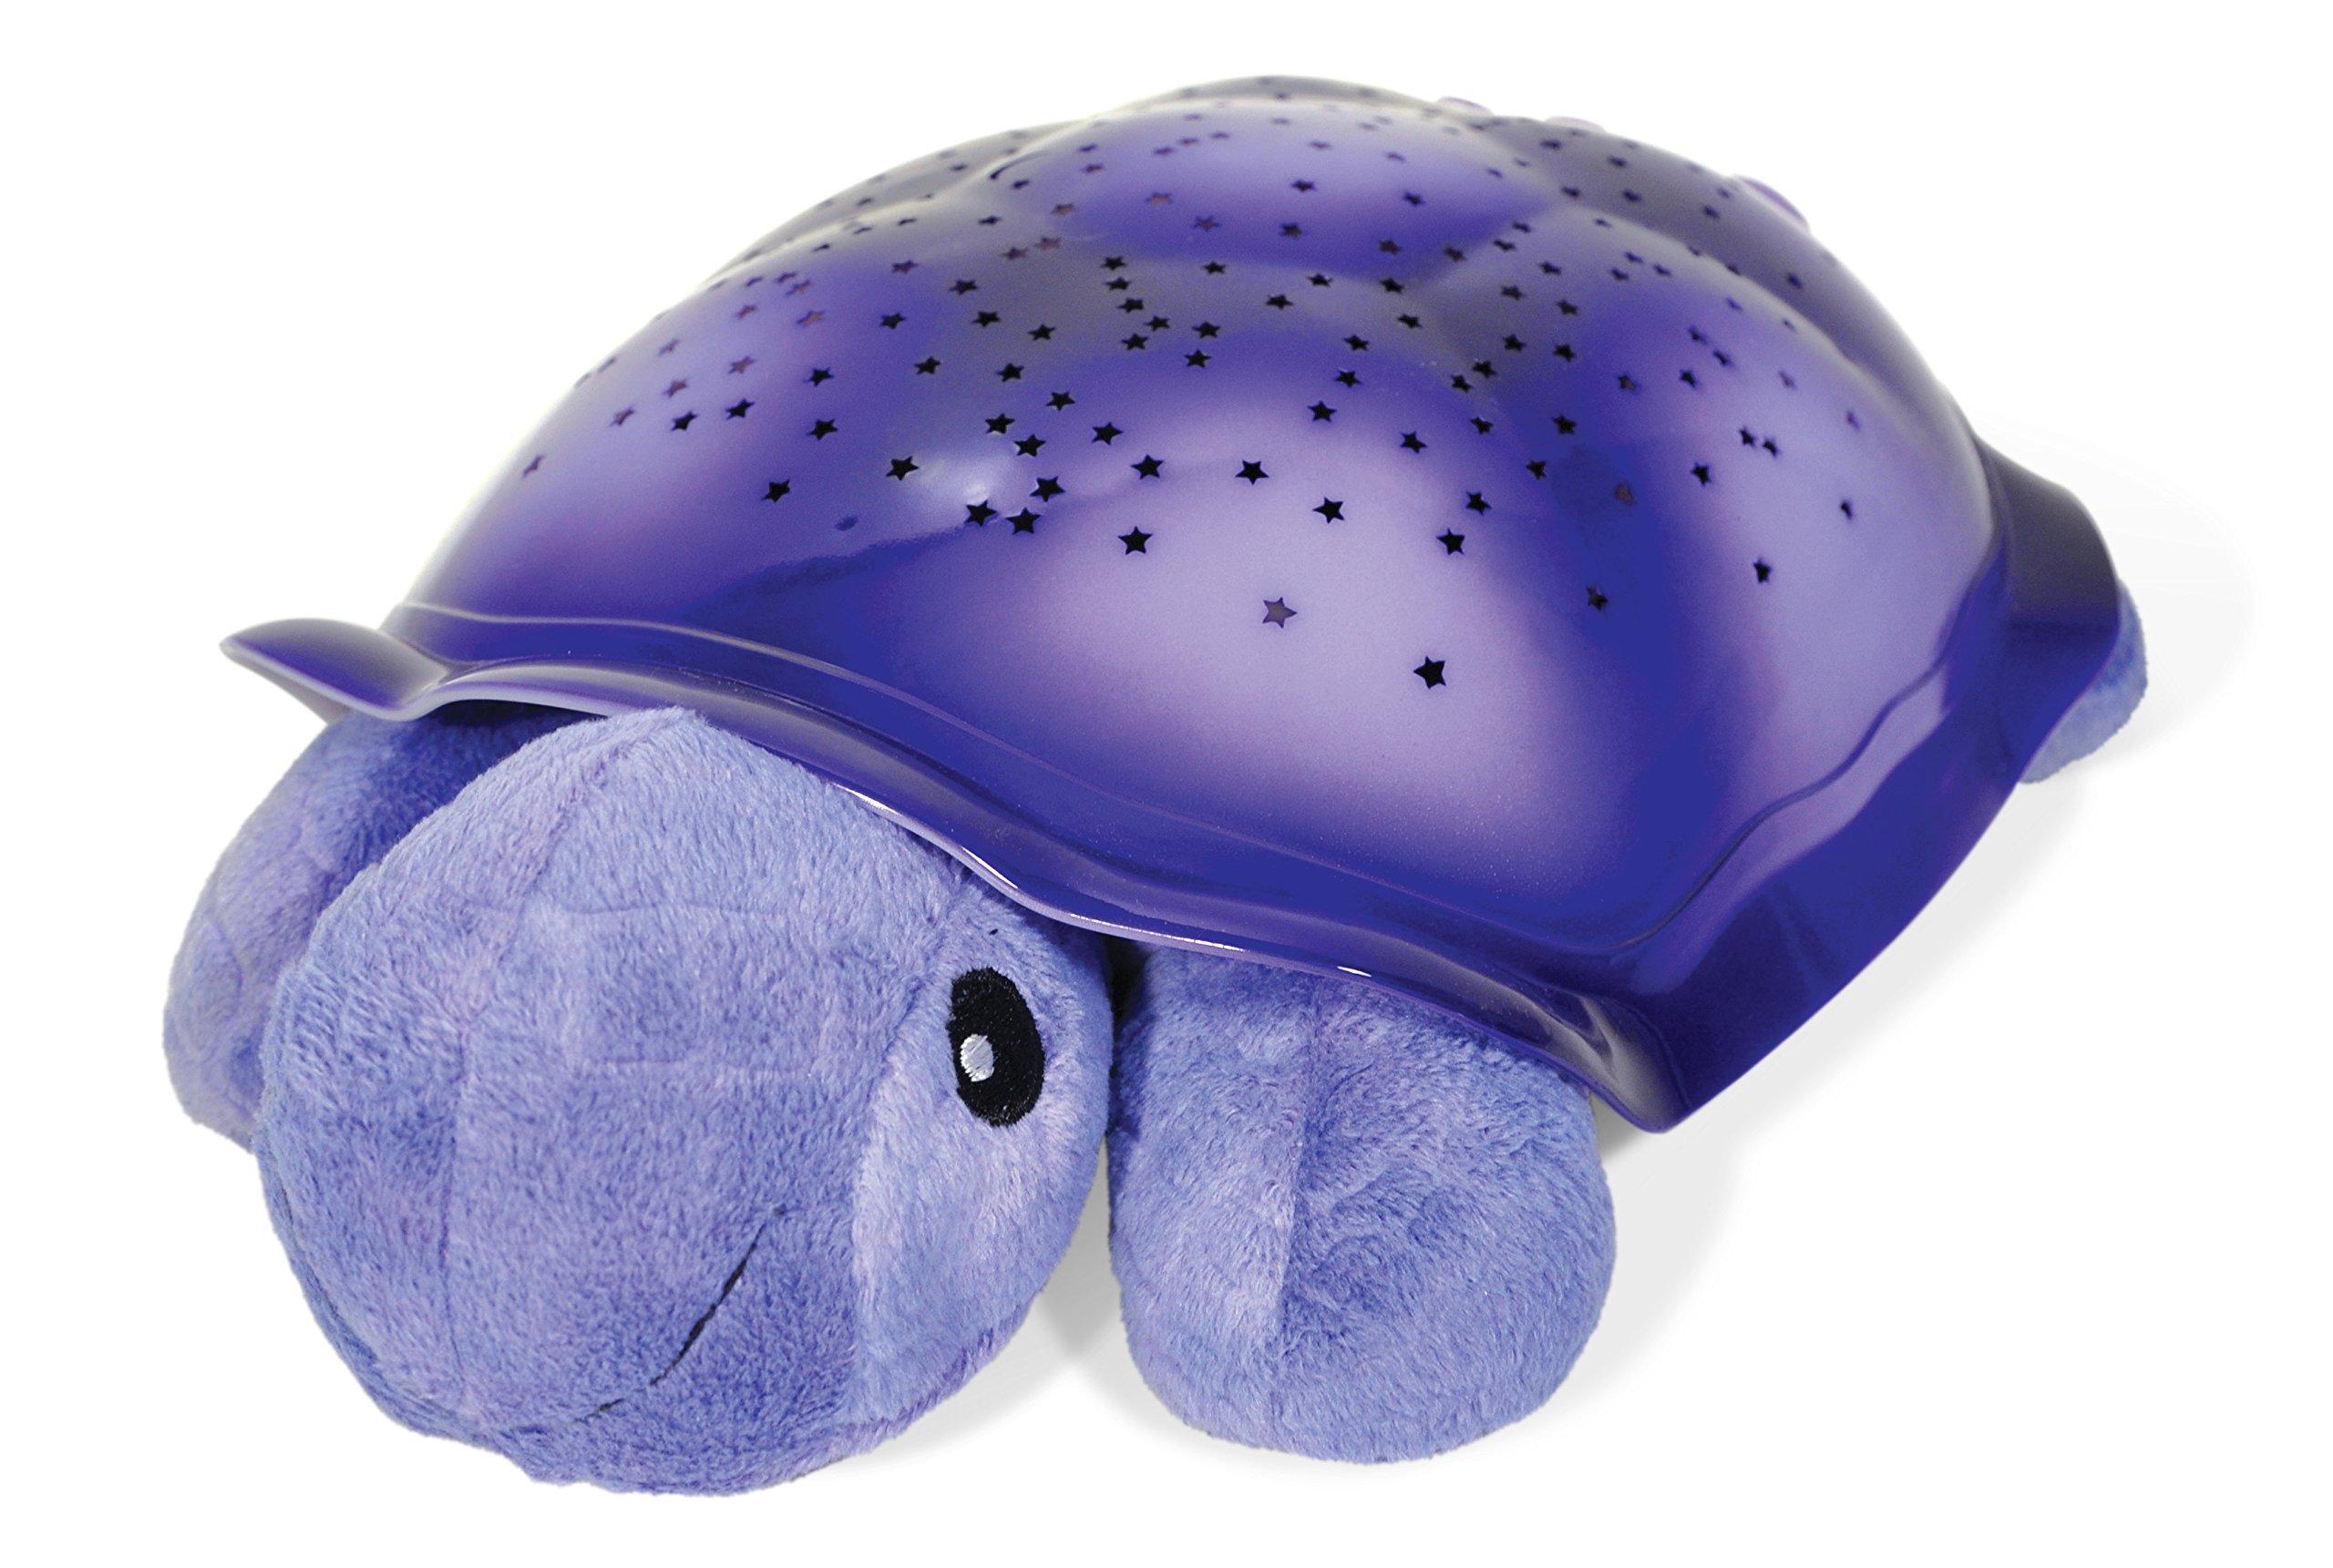 Cloud b Twilight Turtle Purple Plush Nightlight Projector